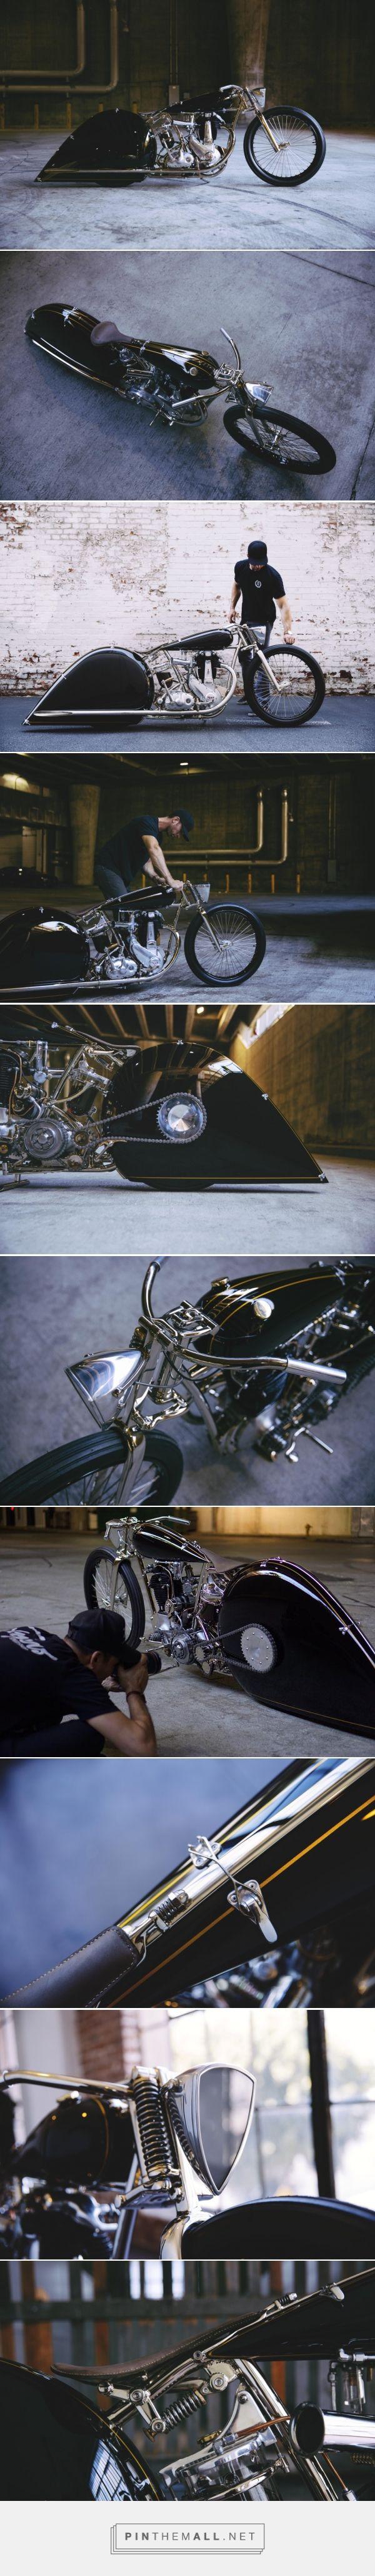 BSA 500 Black | Hazan Motorworks